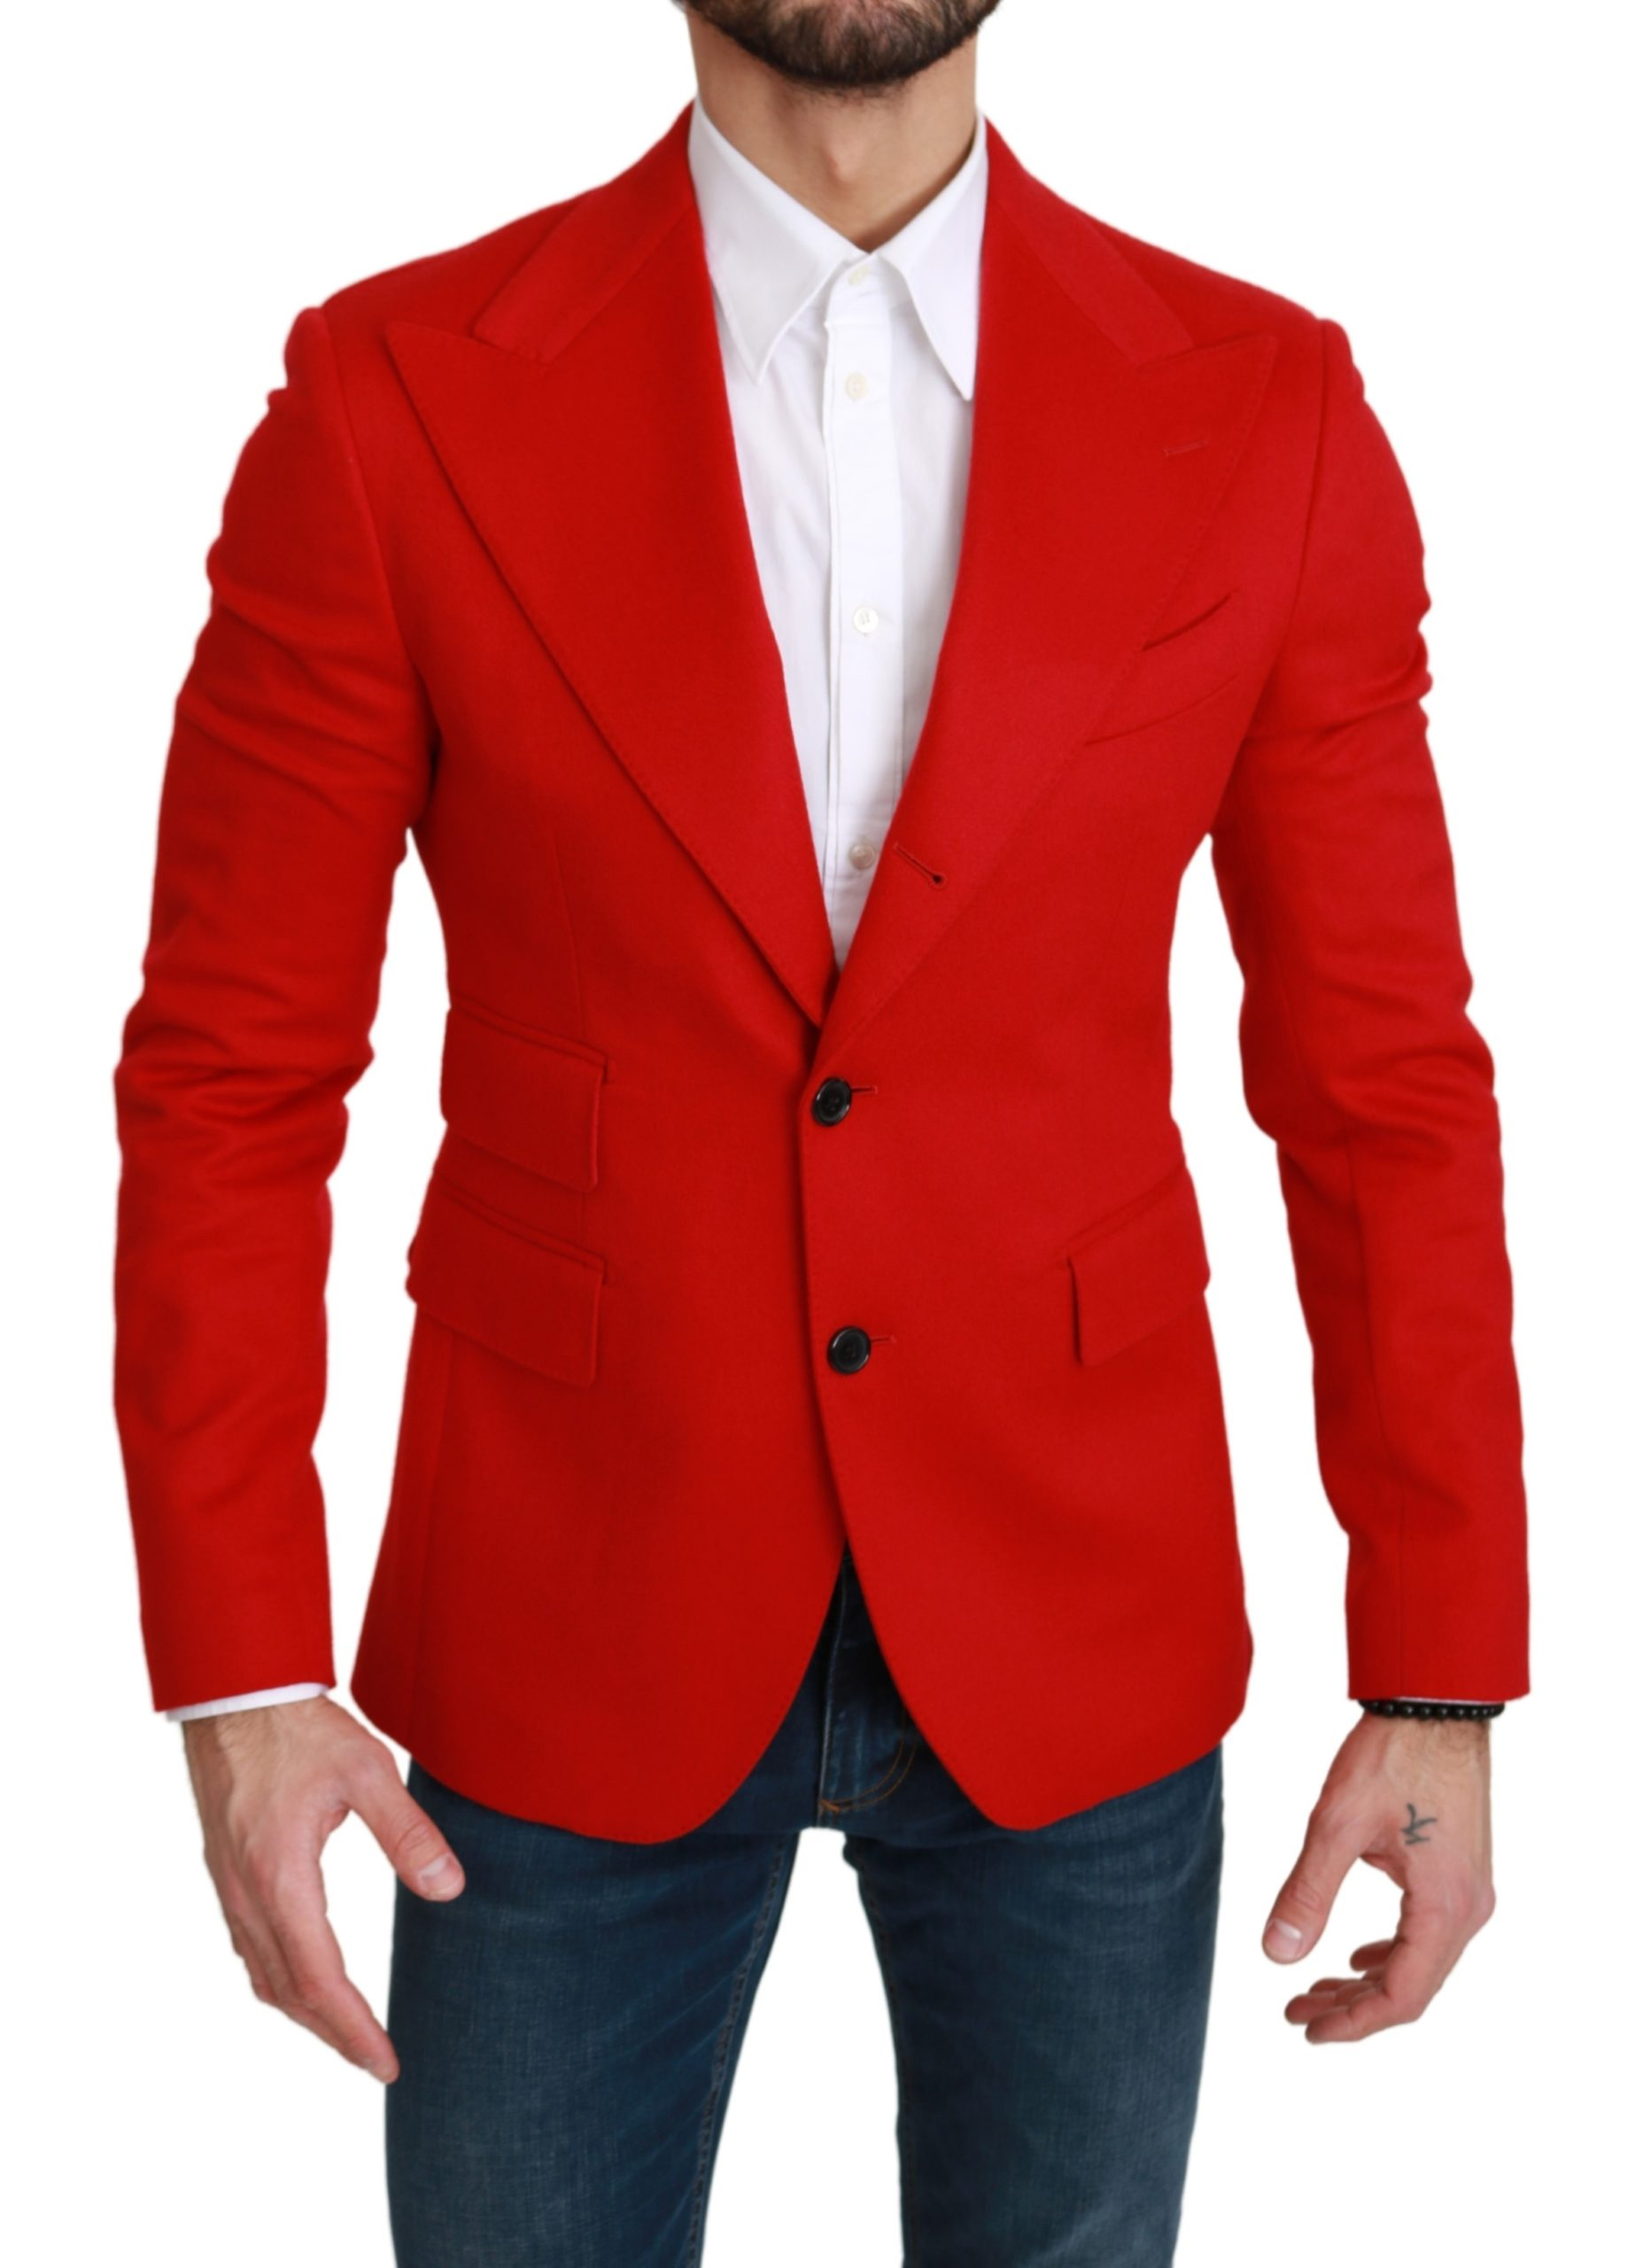 Dolce & Gabbana Men's Cashmere Slim Fit Coat Blazer Red KOS1744 - IT46 | S